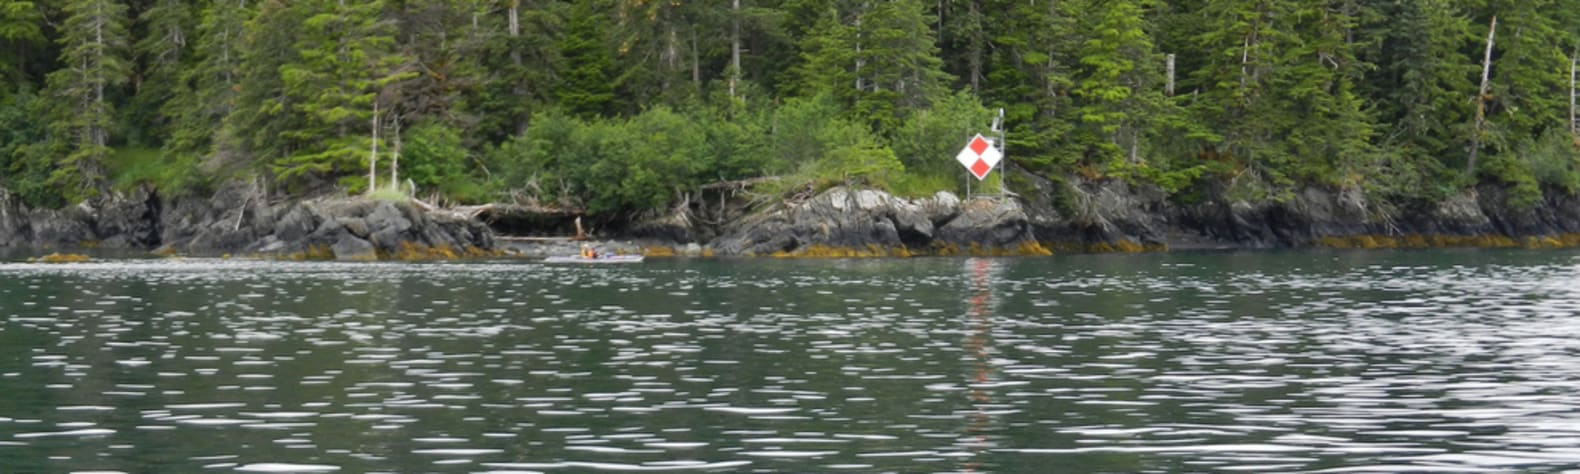 Decision Point State Marine Park